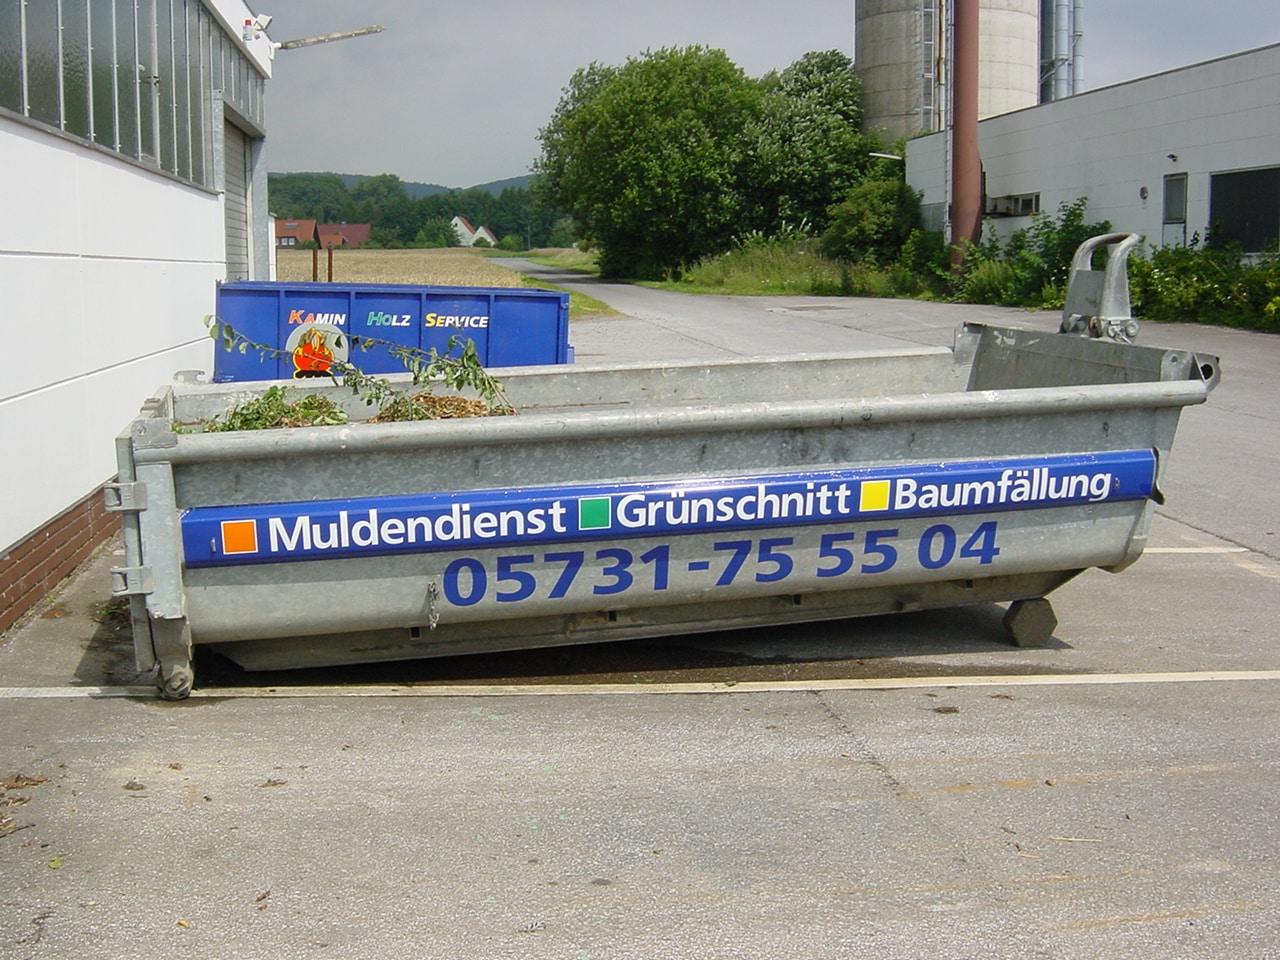 Muldendienst Bad Oeynhausen